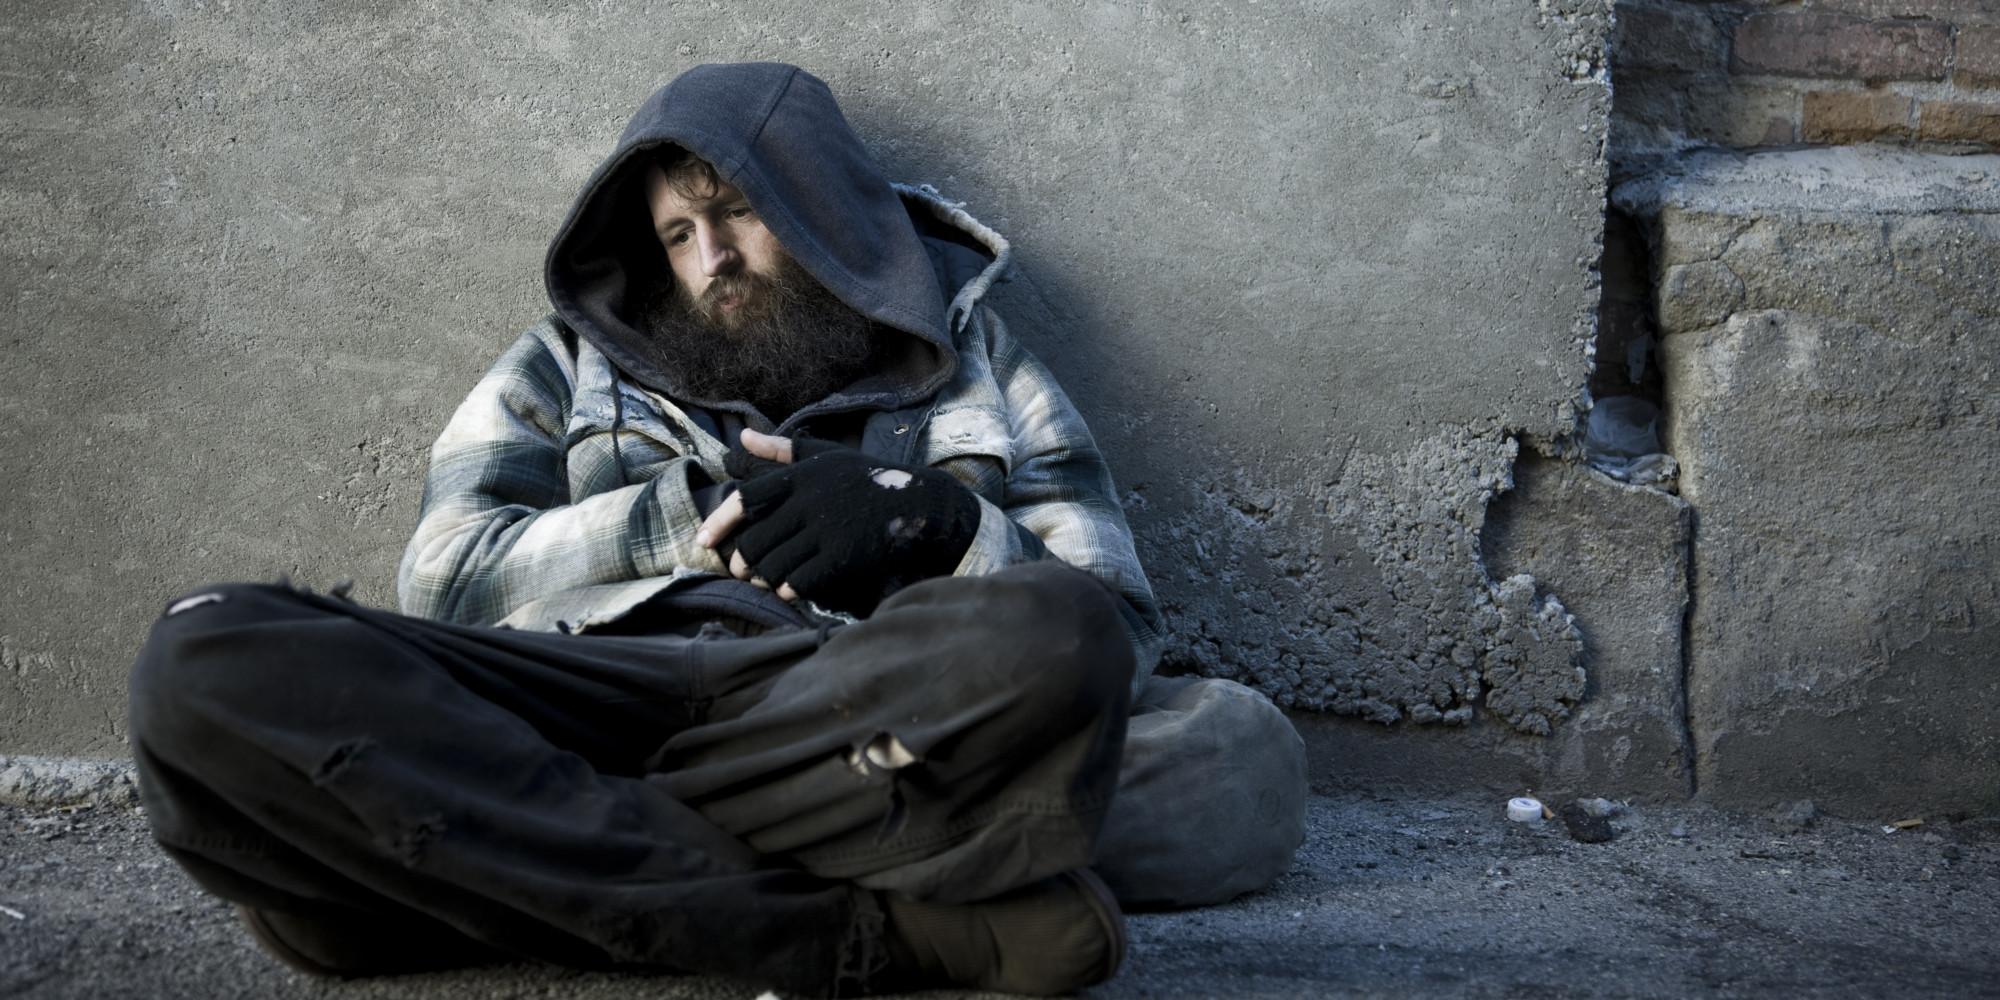 o-seattle-homeless-tour-facebook.jpg